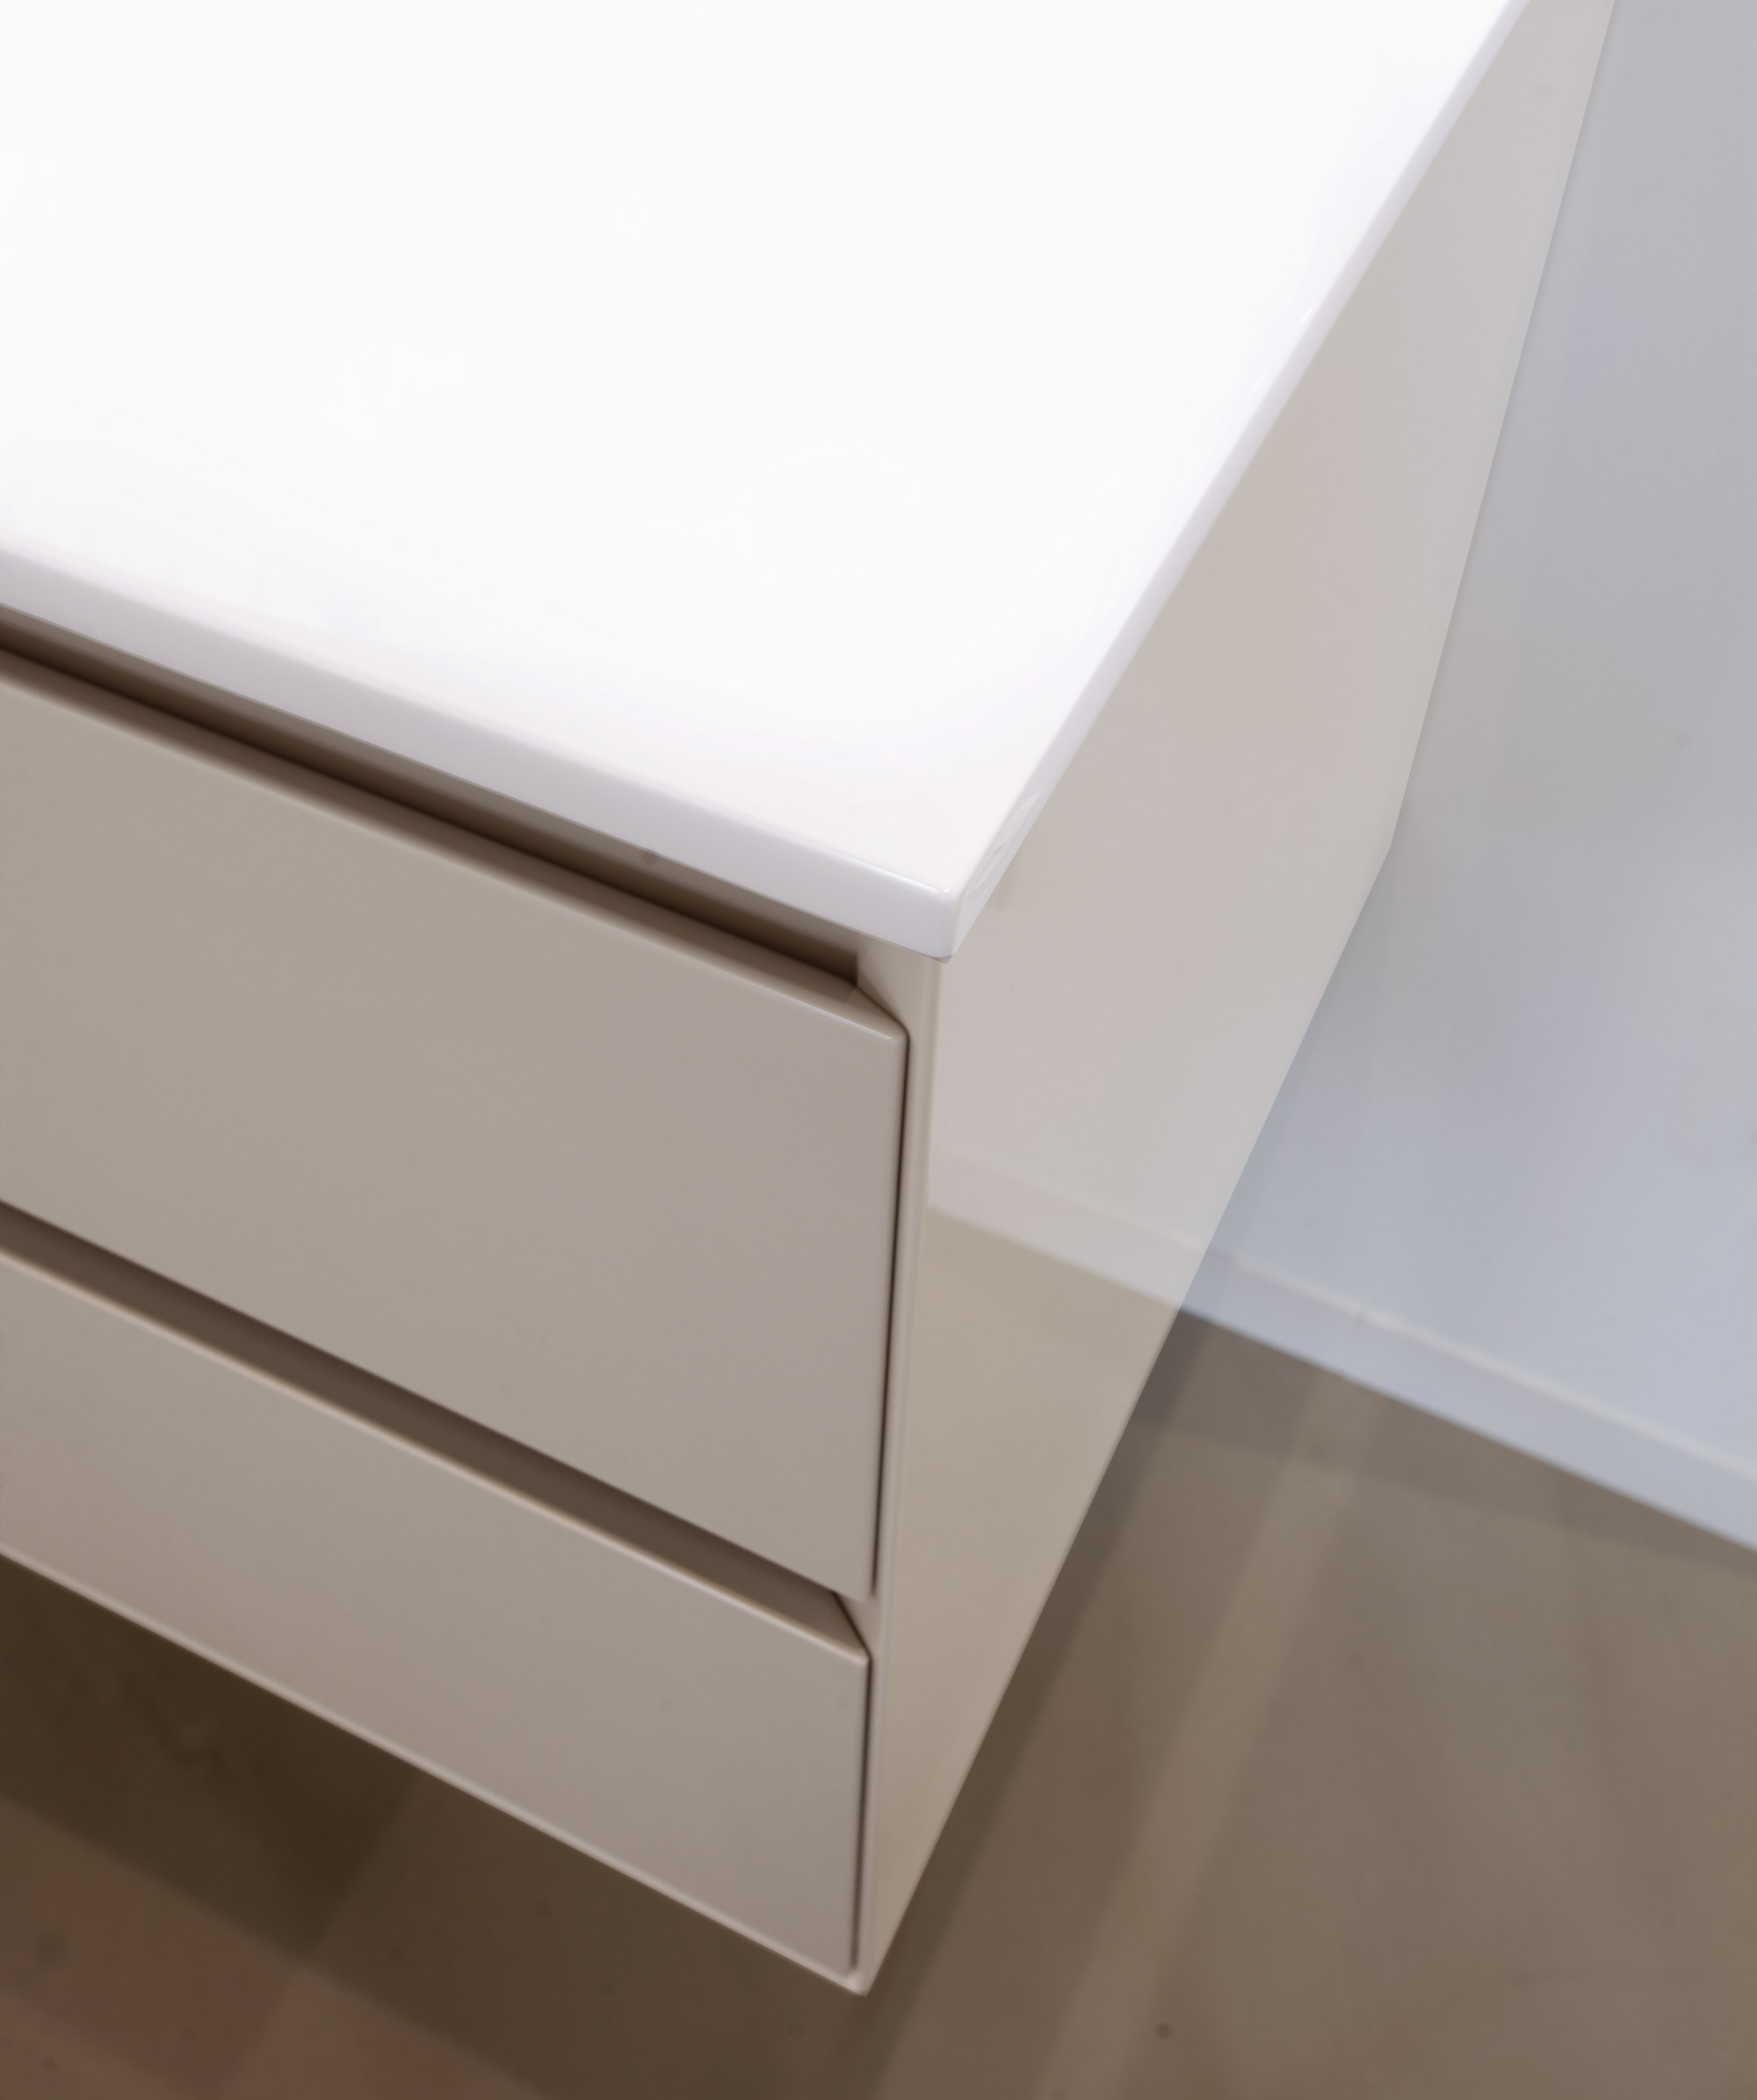 Elite meubles de salle de bains baignoires fabricant for Fabricant meuble salle de bain